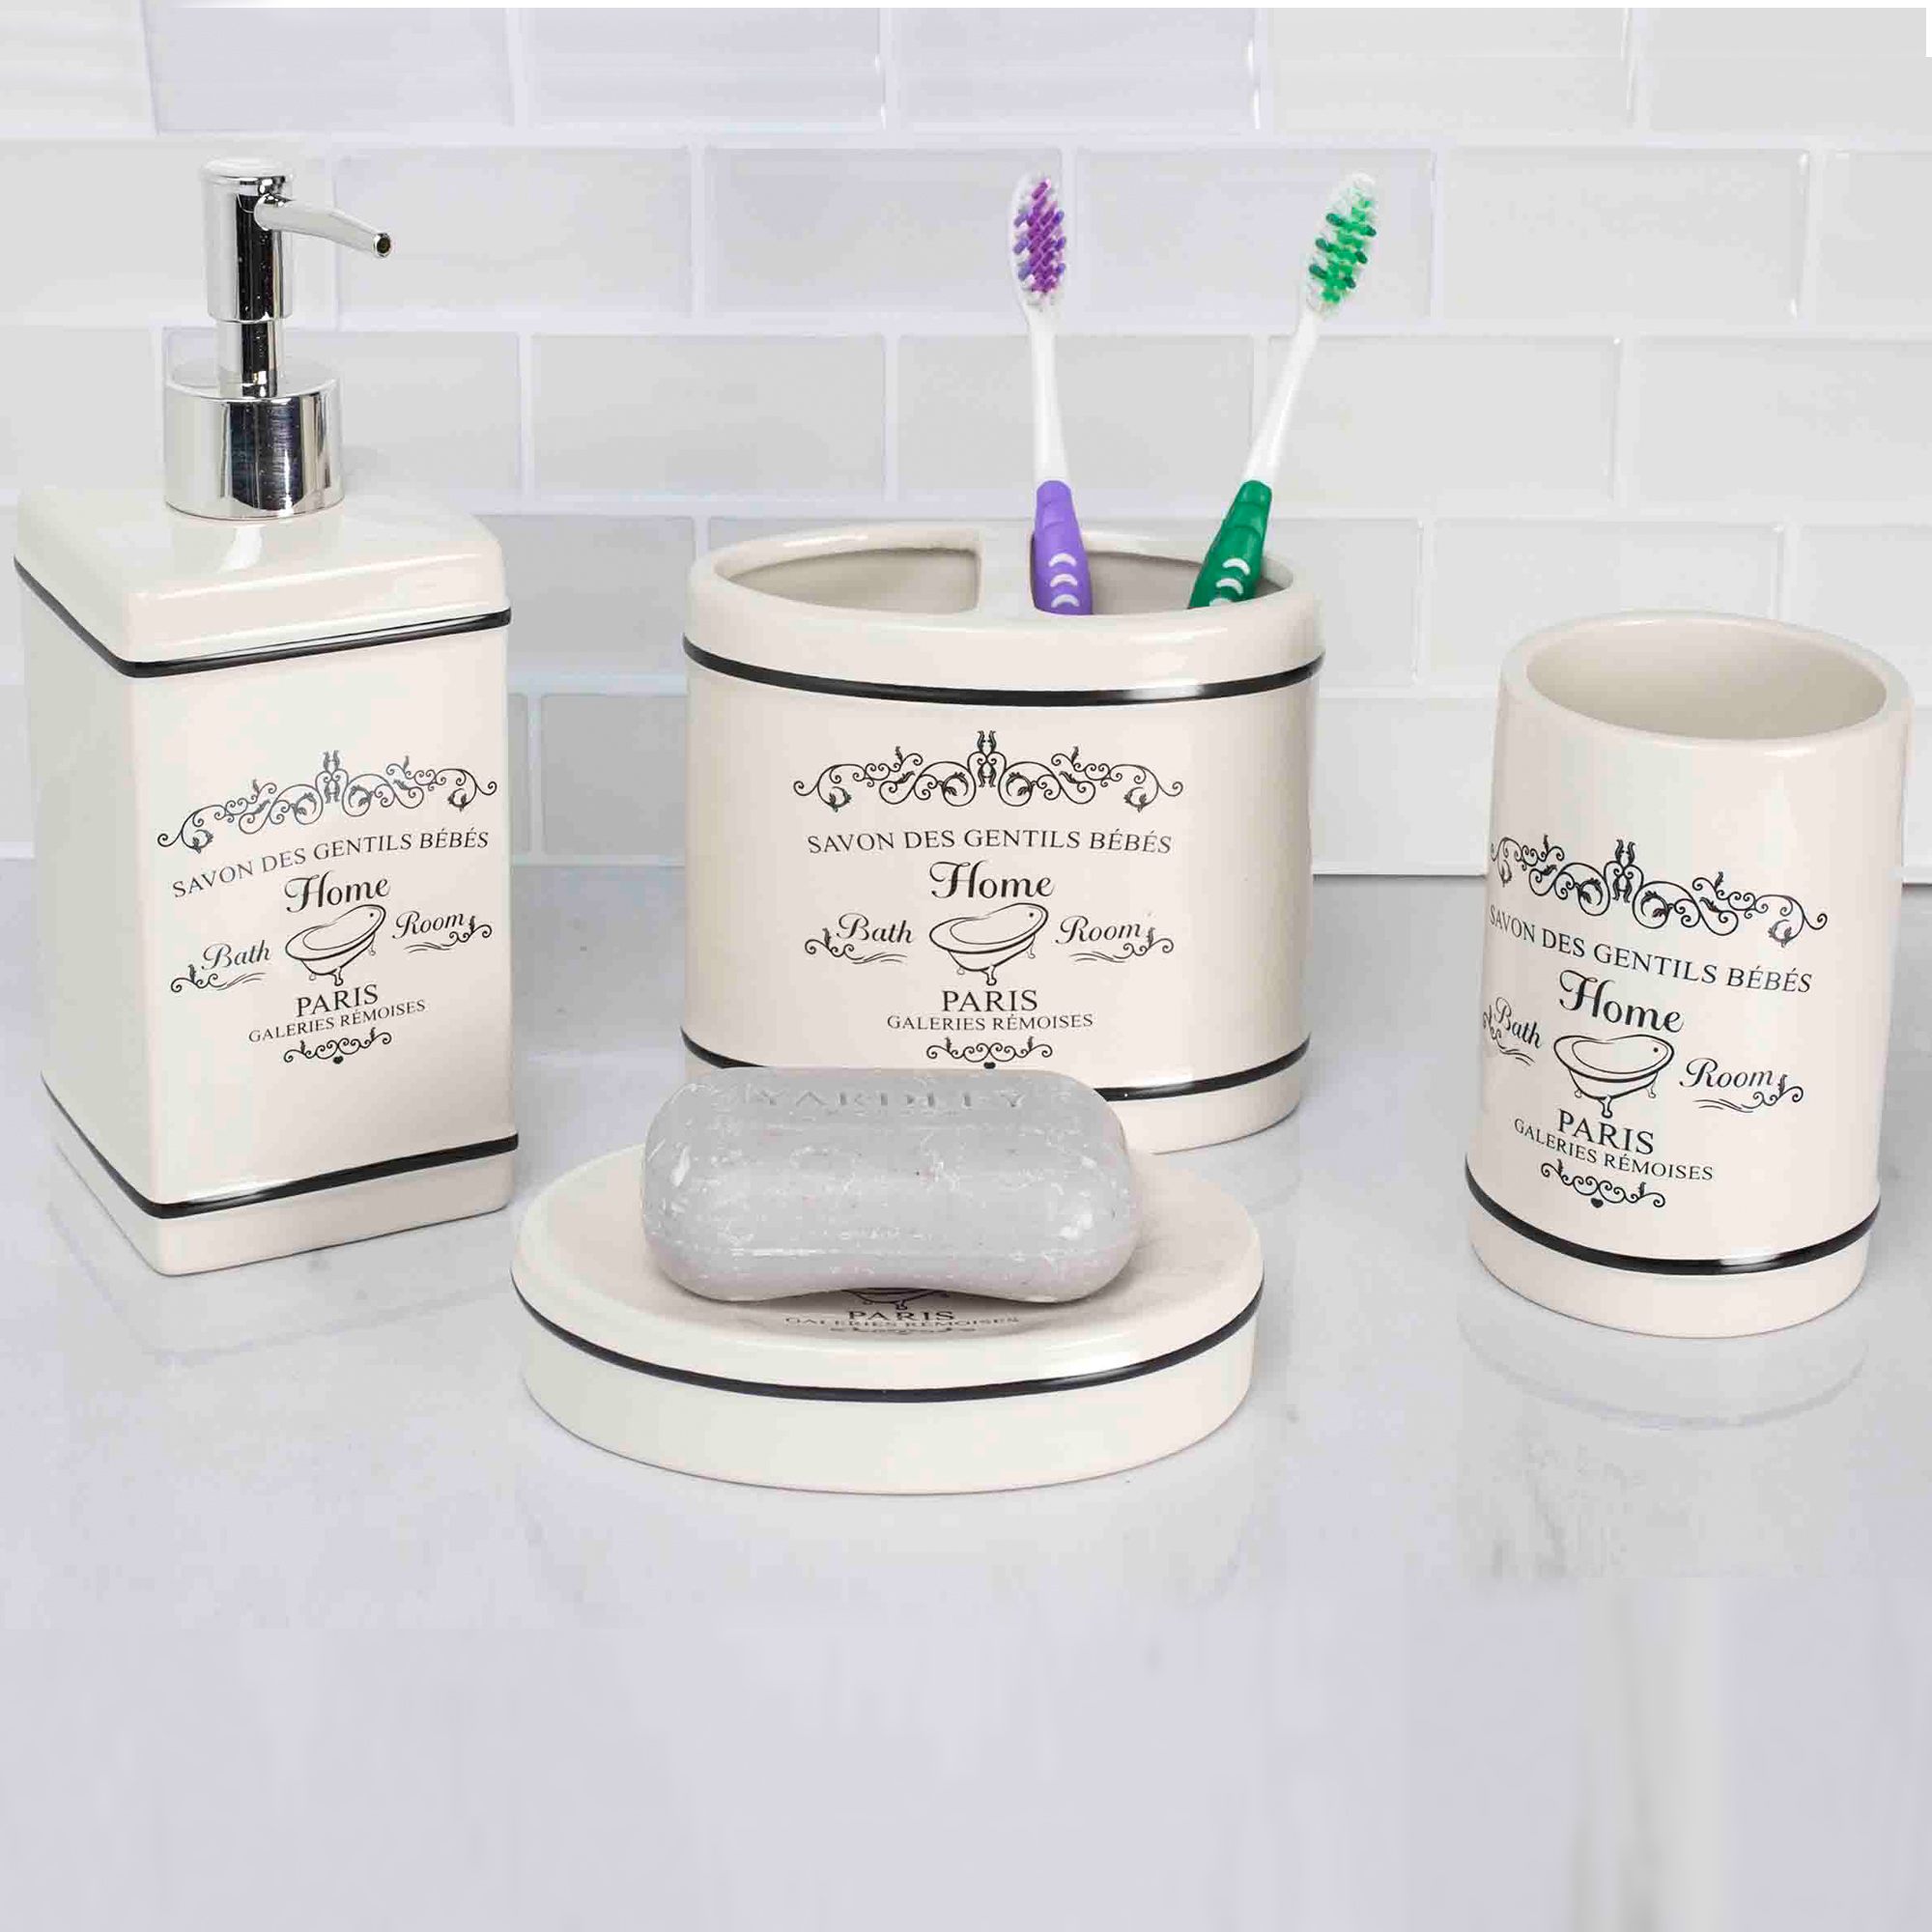 Home Basics Paris White Ceramic Bathroom Accessories 4 Piece Set